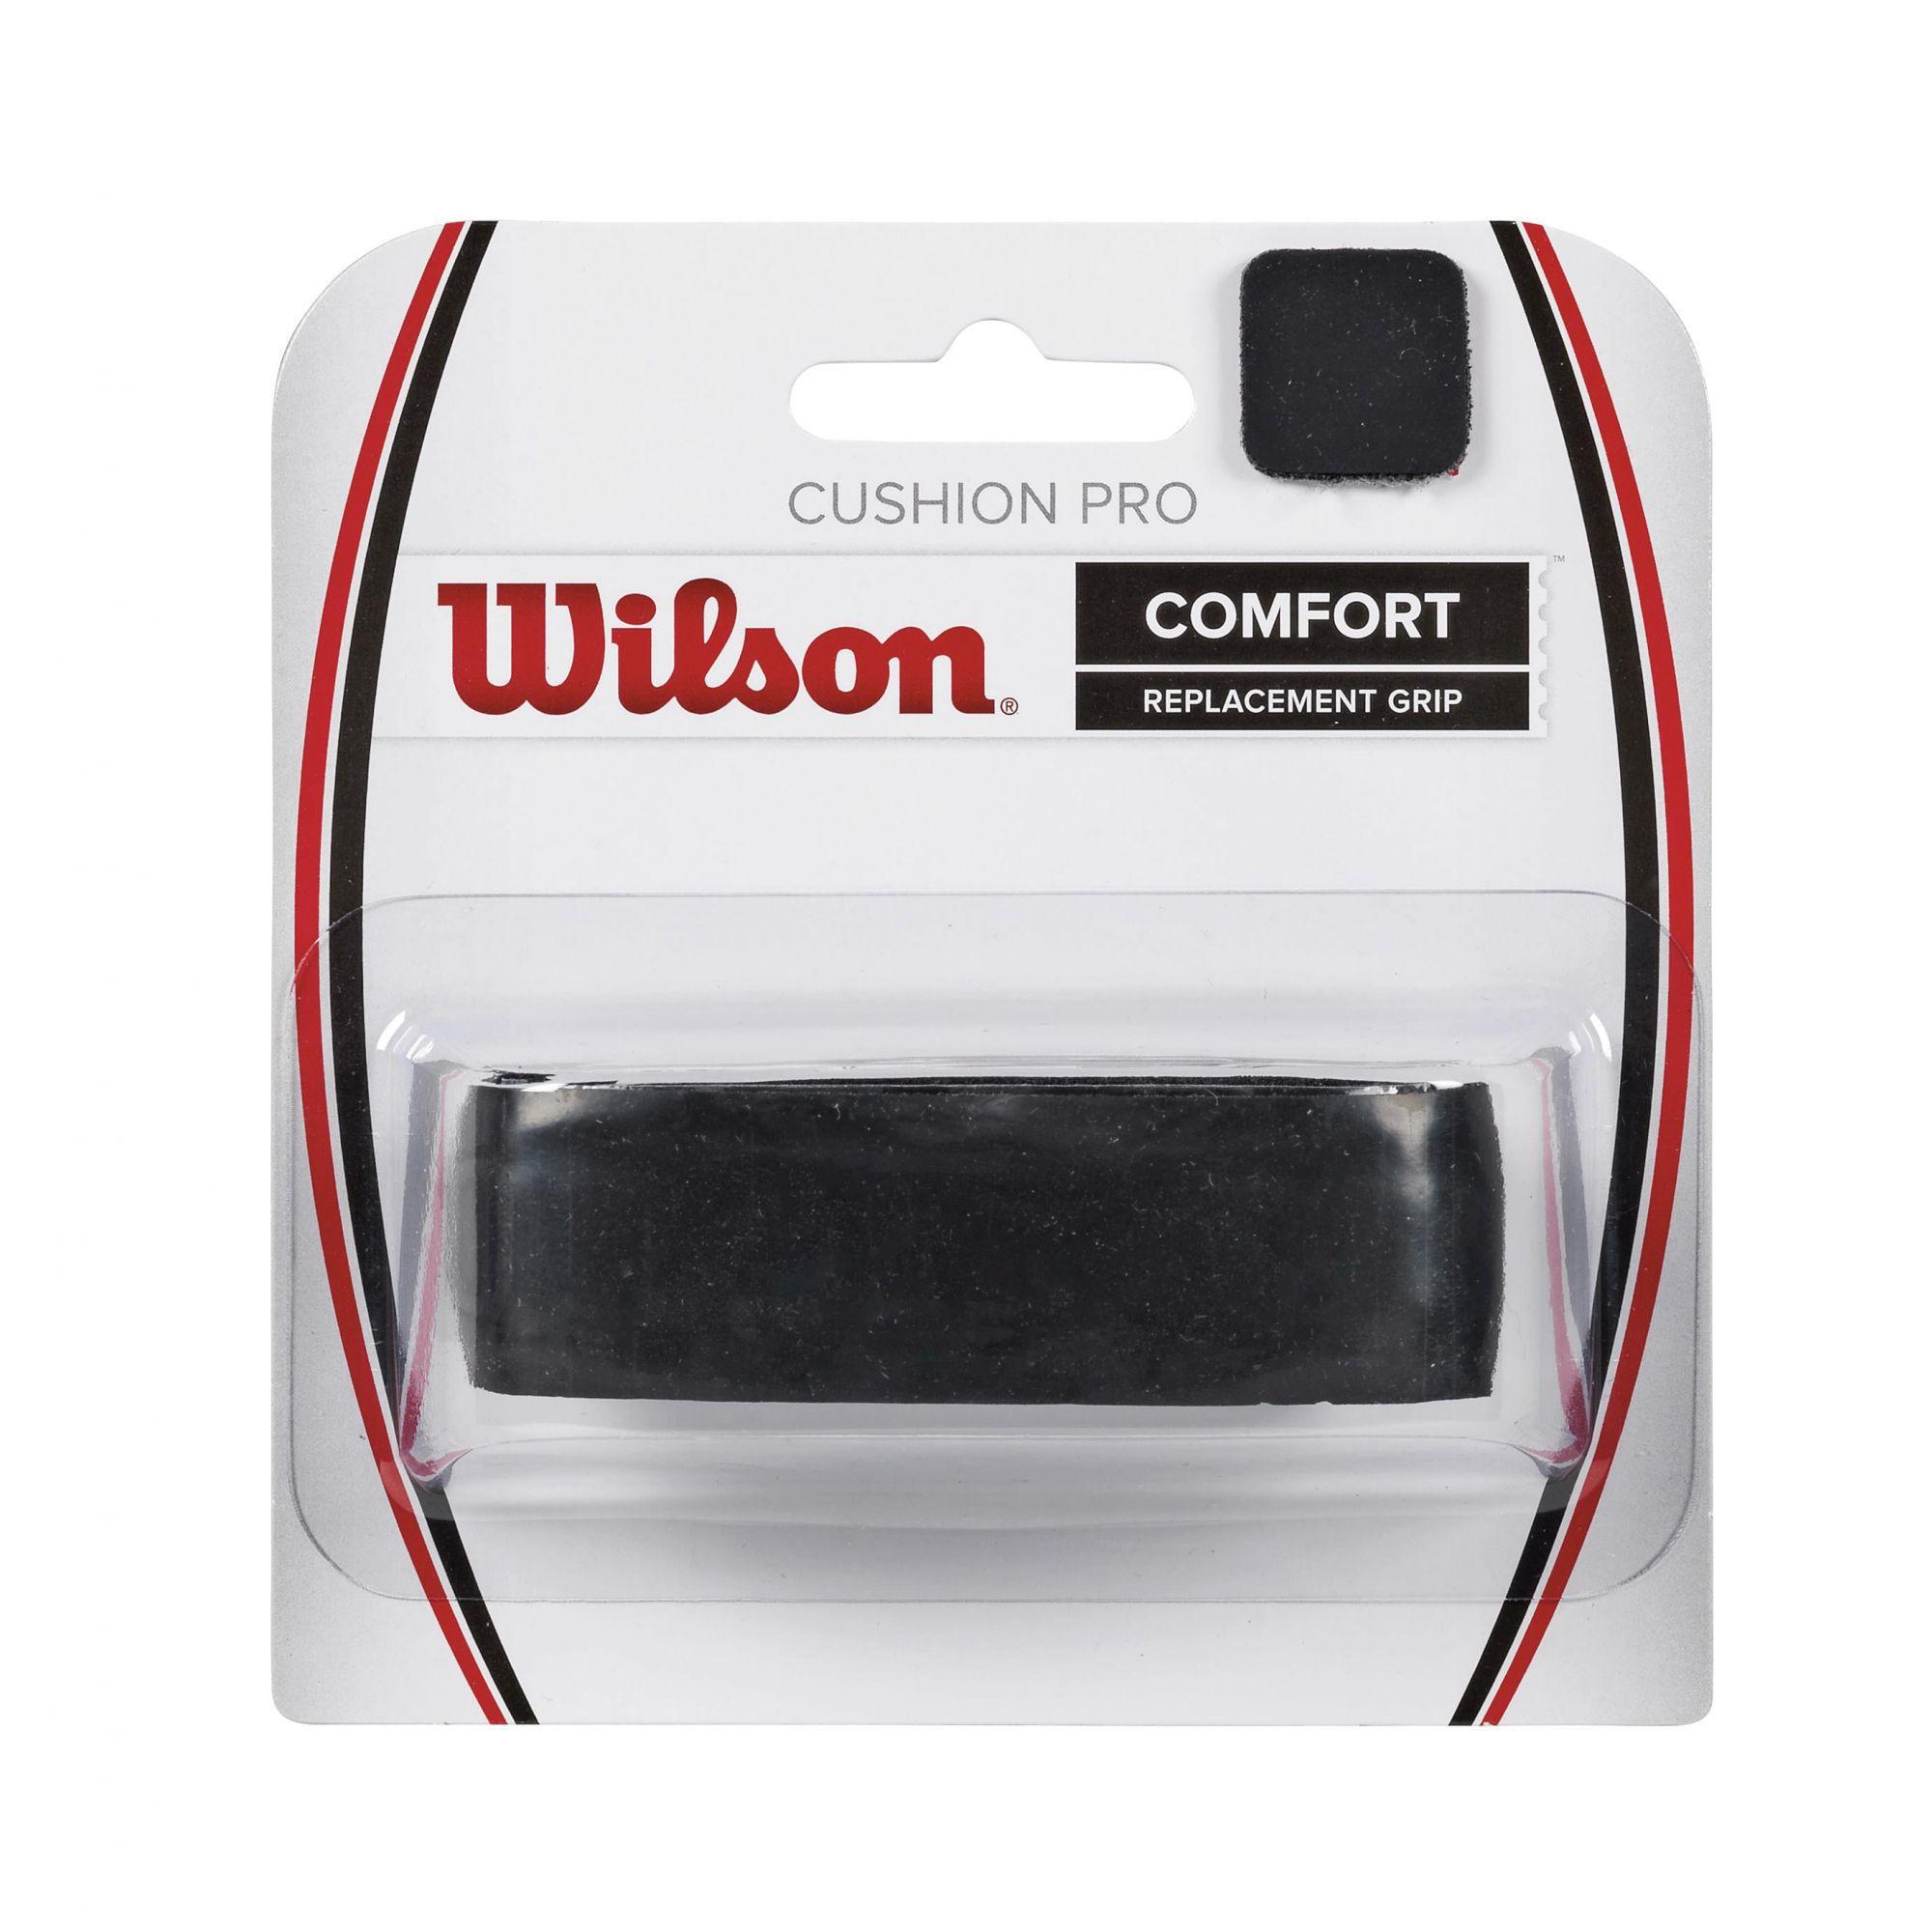 Cushion Grip Wilson Pro Comfort - Preto  - REAL ESPORTE